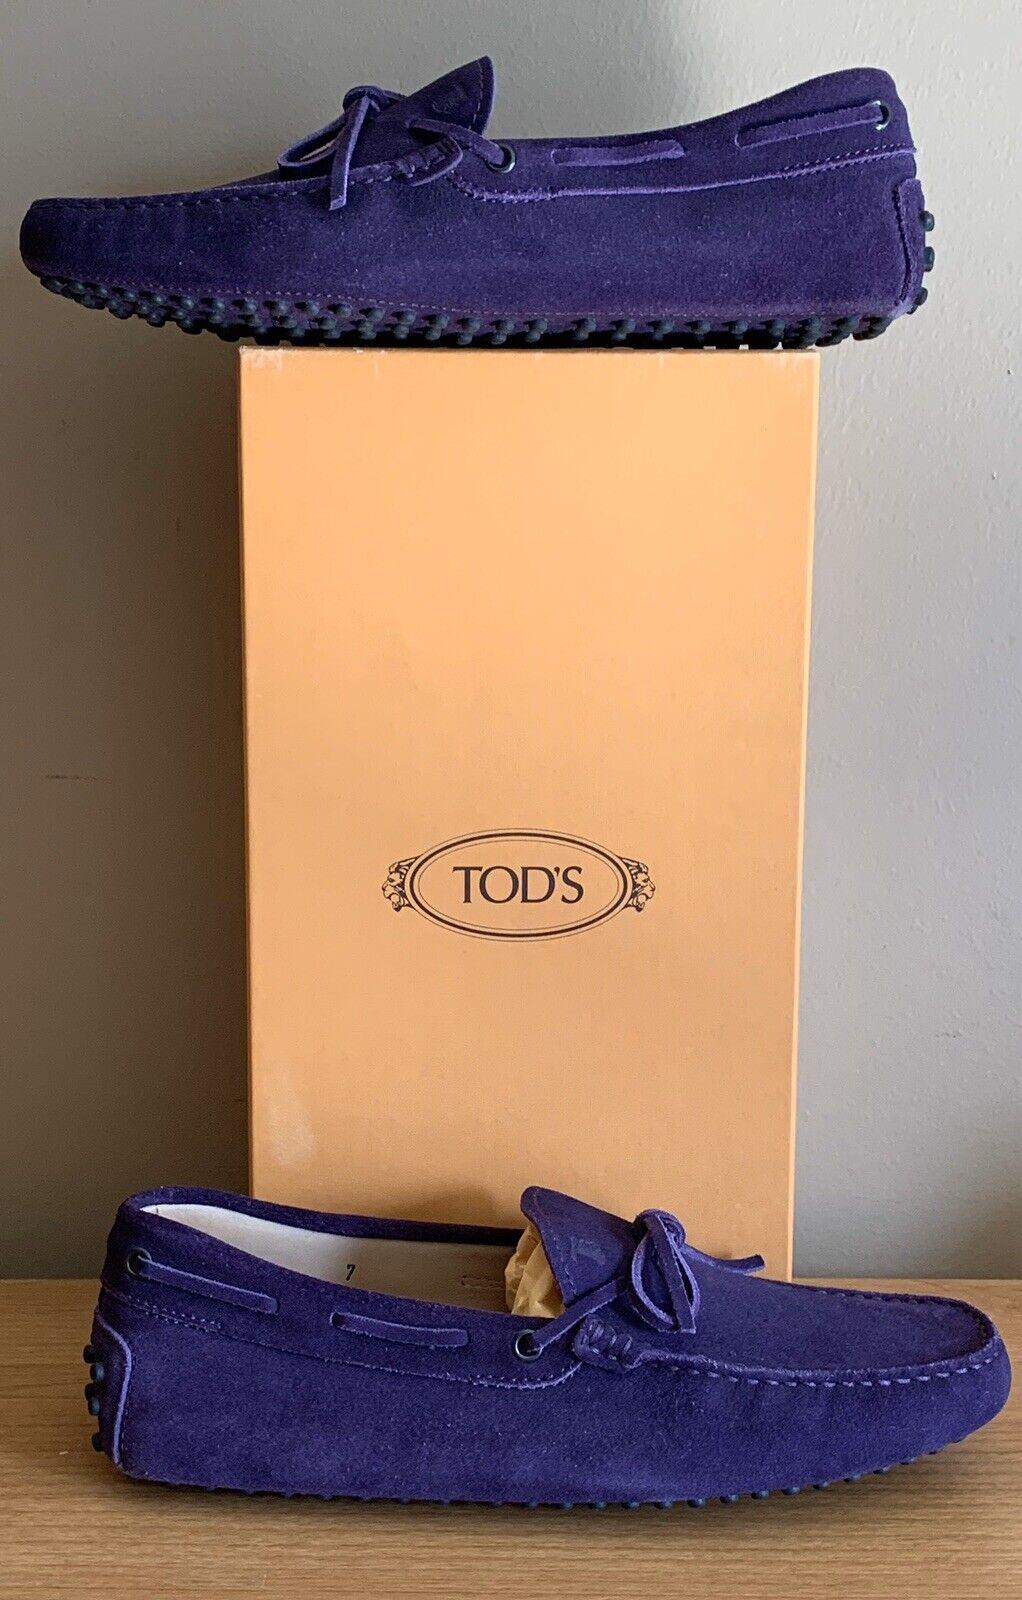 Auténtico Gamuza Mocasines para Conducir Tod'S GOMMINO, Púrpura, Talla 7 EE. UU. 40 EUR